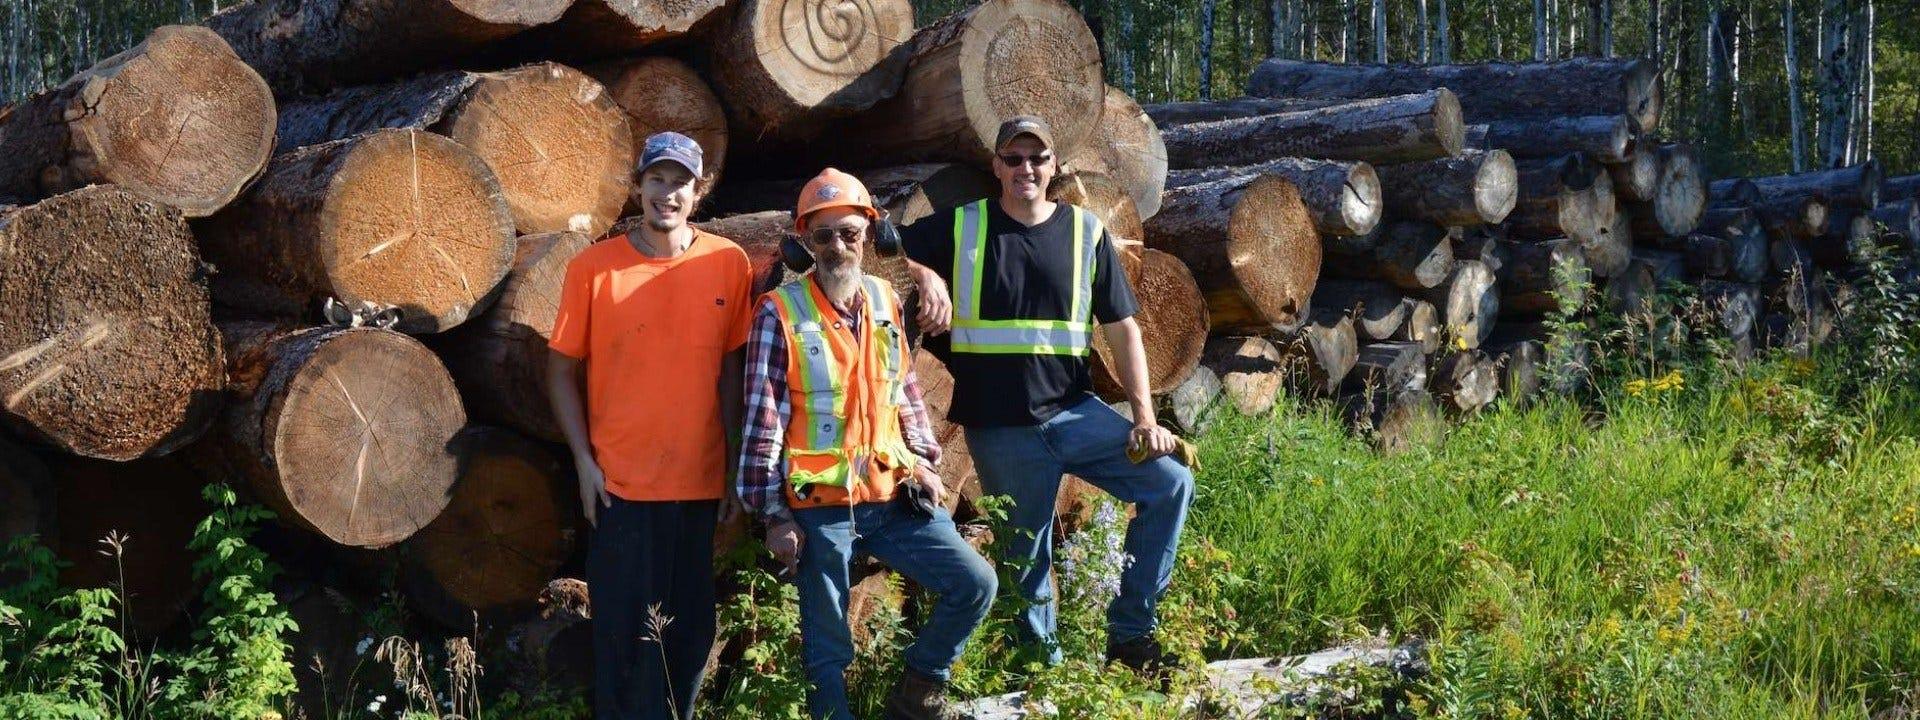 Saskatchewan Sawmiller Doubles Production with Wood-Mizer Portable Sawmill